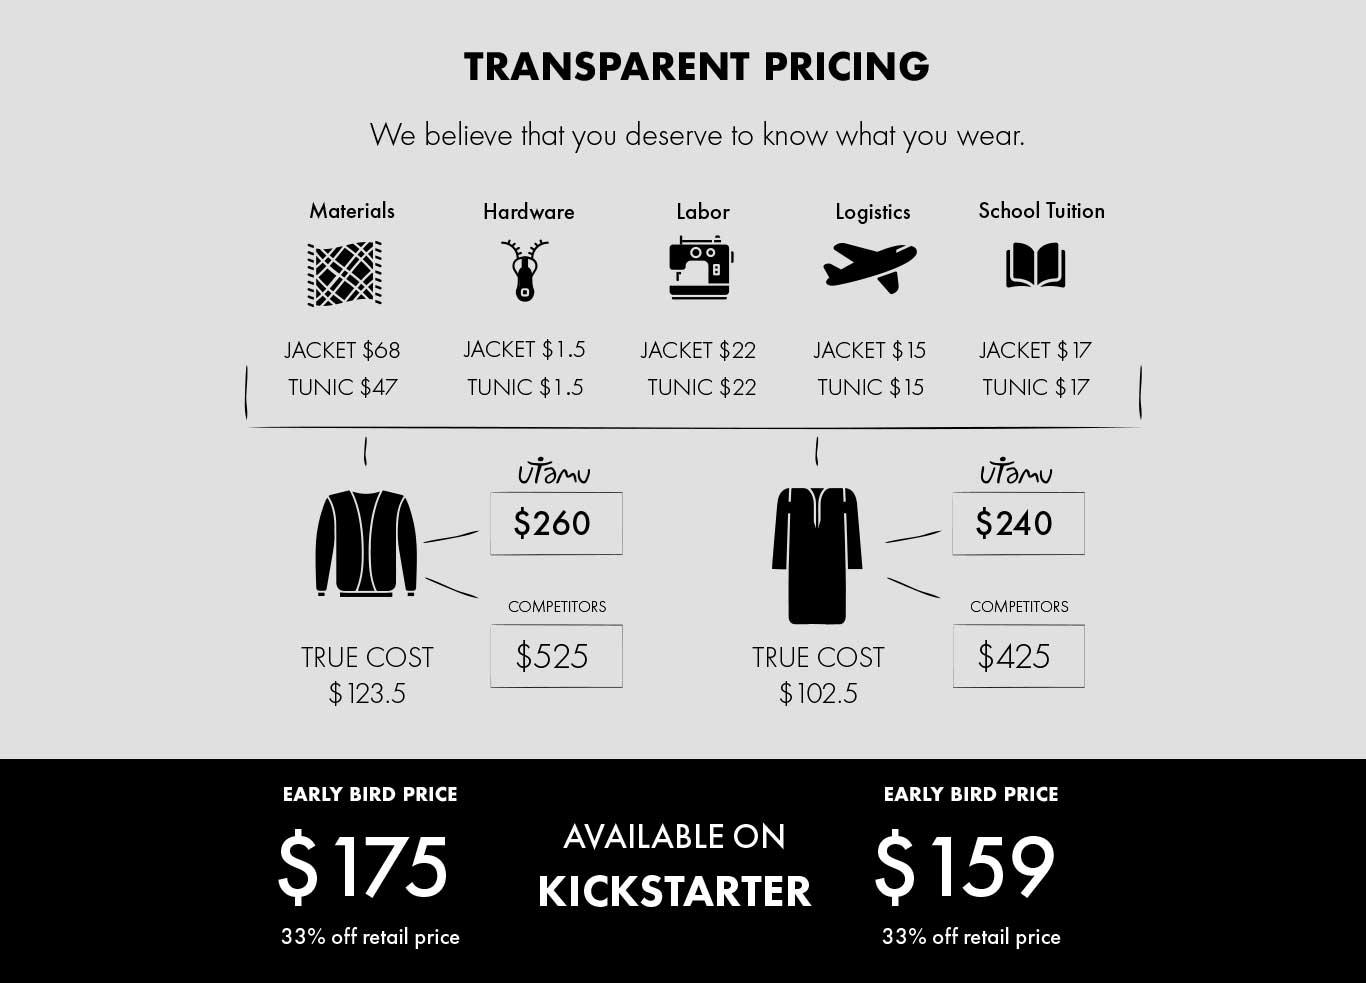 transparent-pricing-utamu.jpg